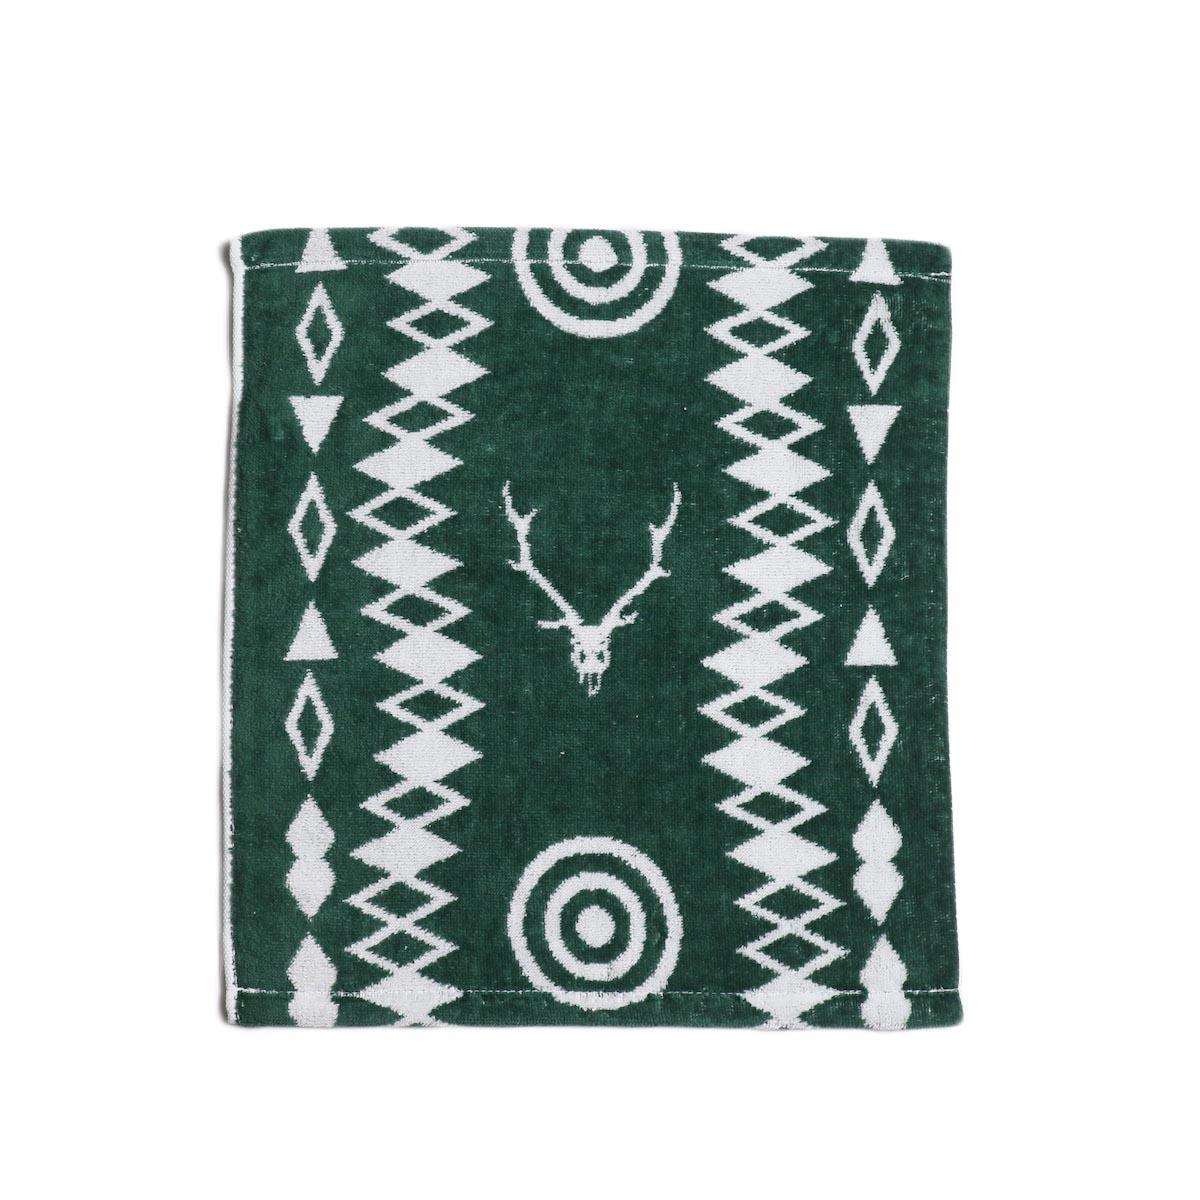 South2 West8 / Wash Towel -Cotton Jacquard (Target & Skull)